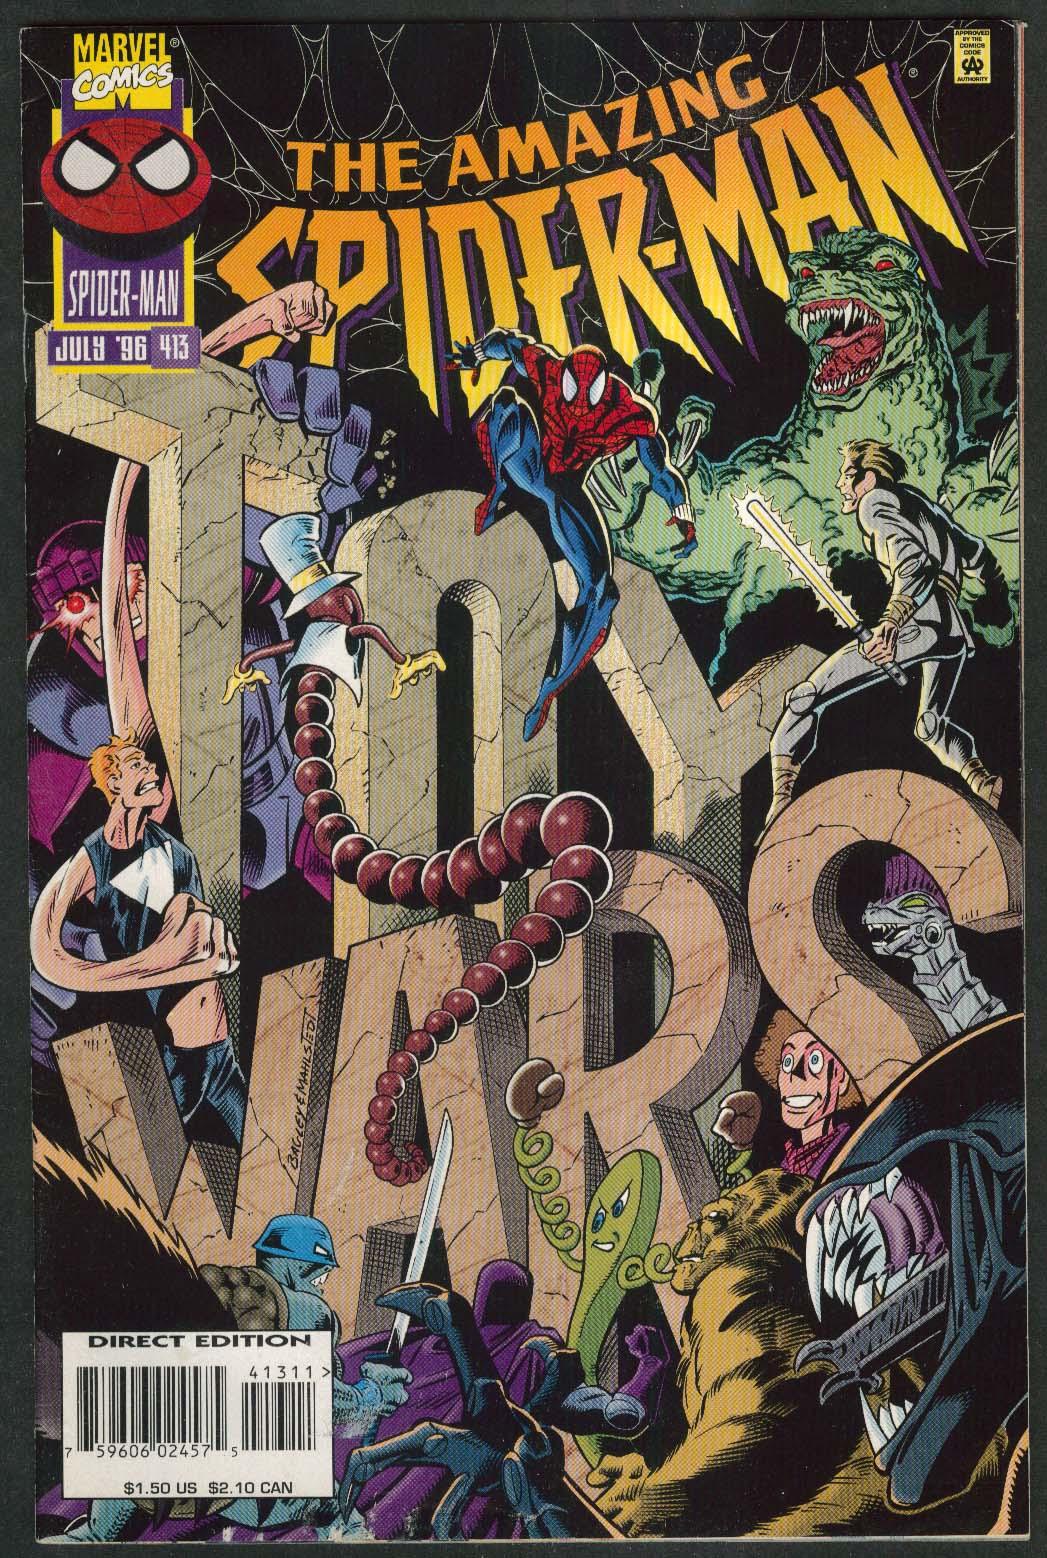 AMAZING SPIDER-MAN #413 Marvel comic book 7 1996